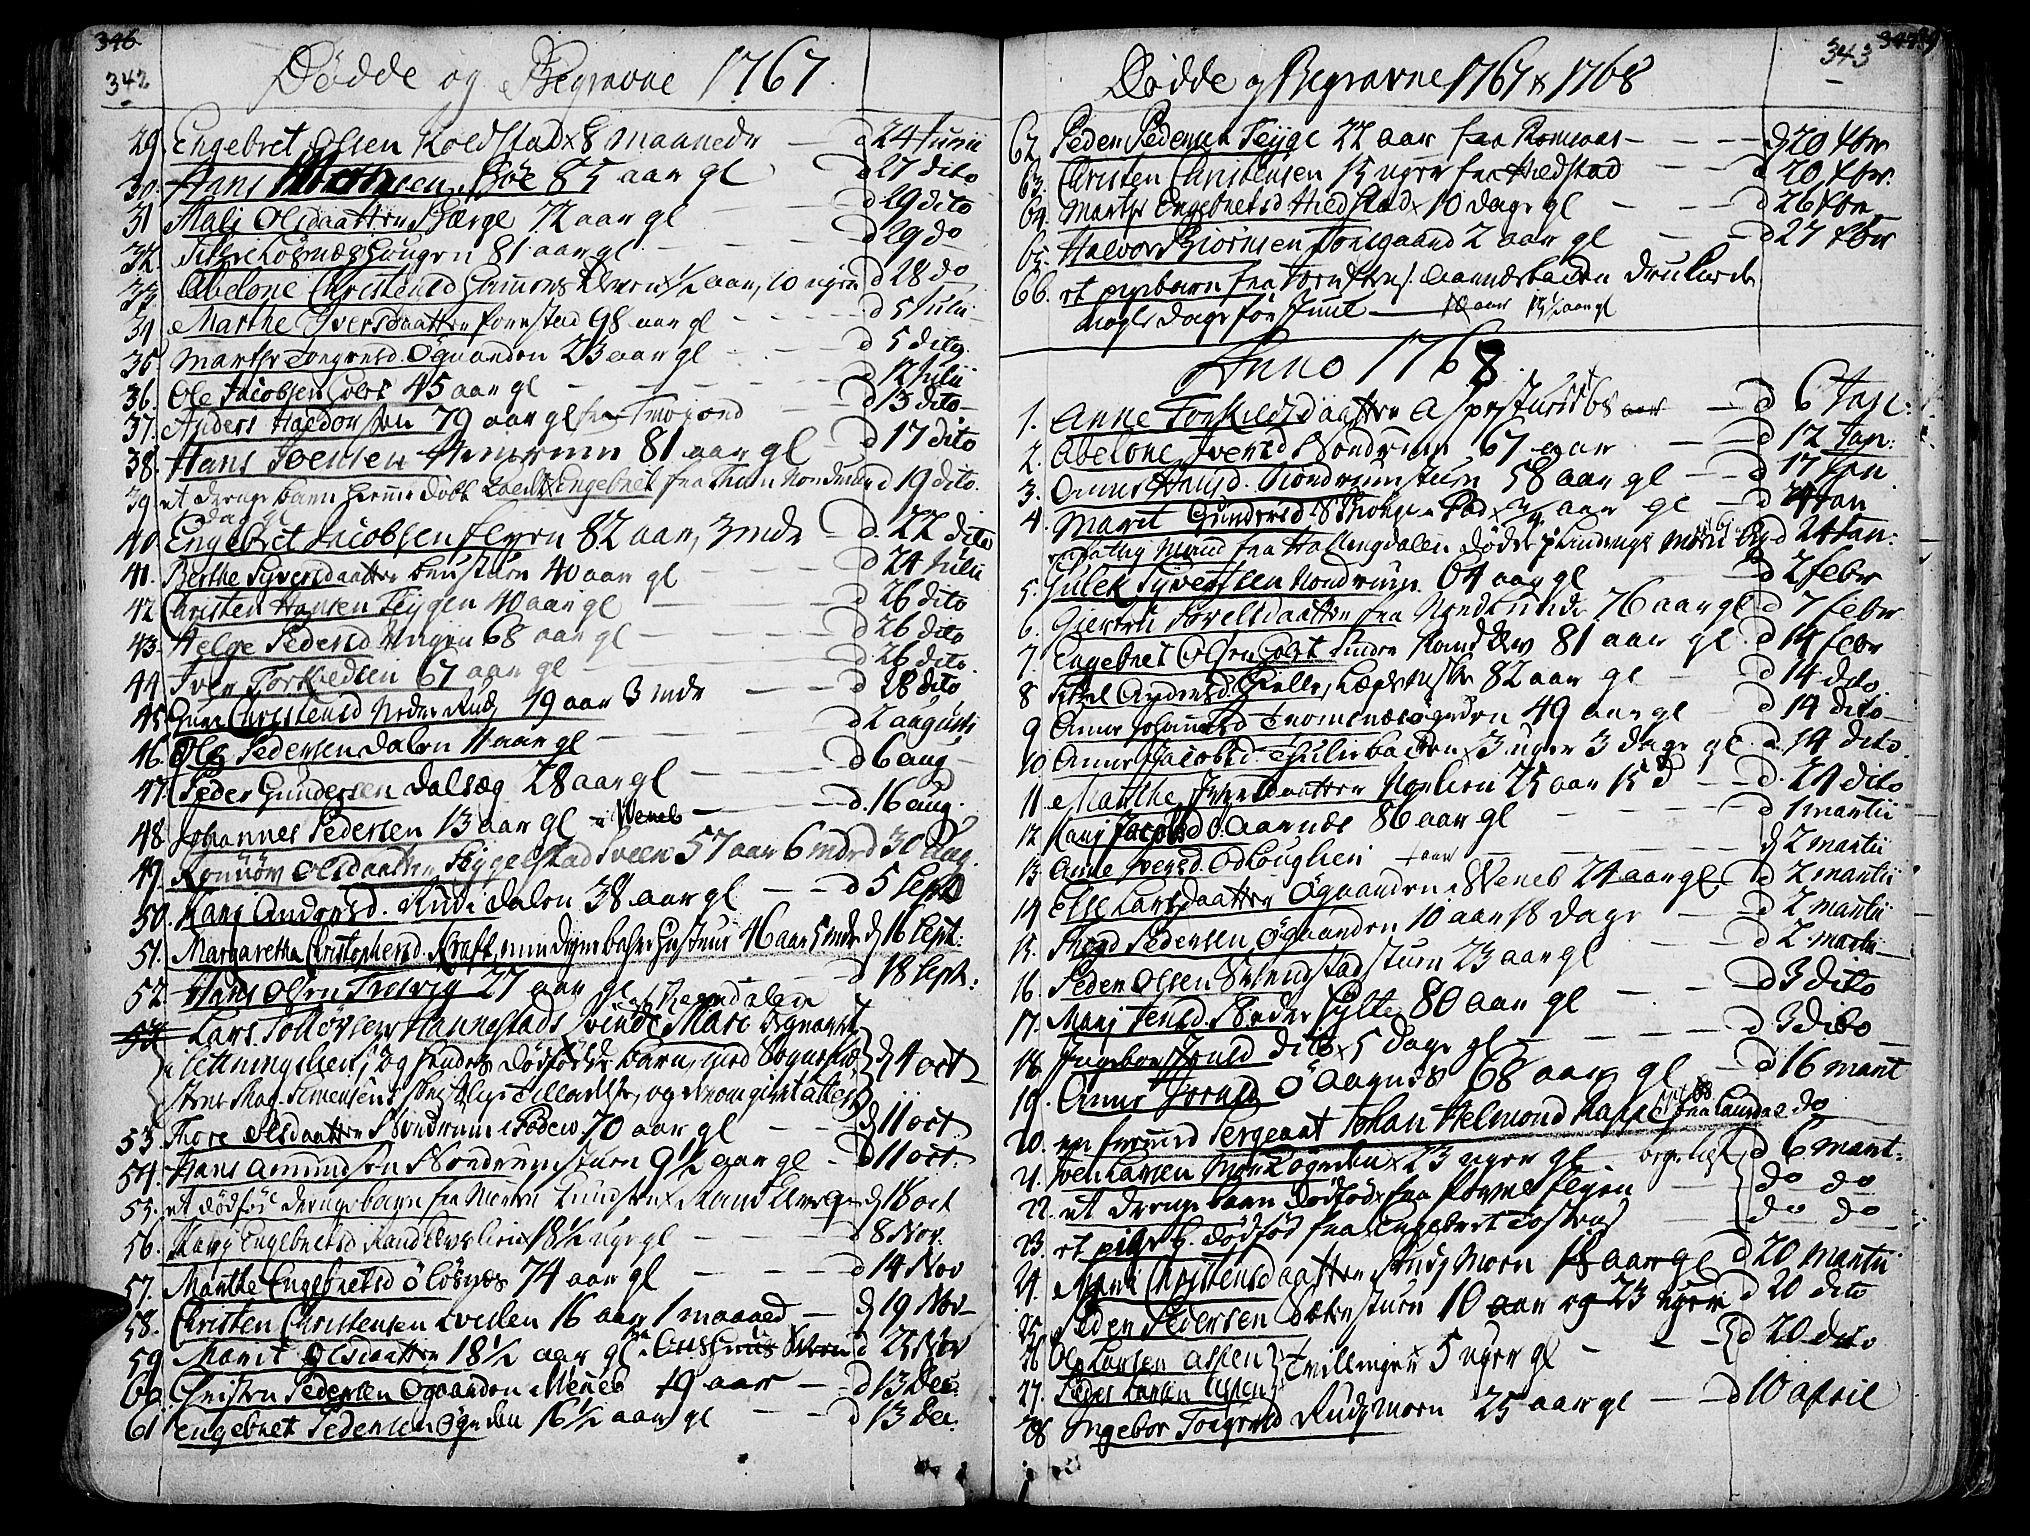 SAH, Ringebu prestekontor, Ministerialbok nr. 2, 1734-1780, s. 342-343